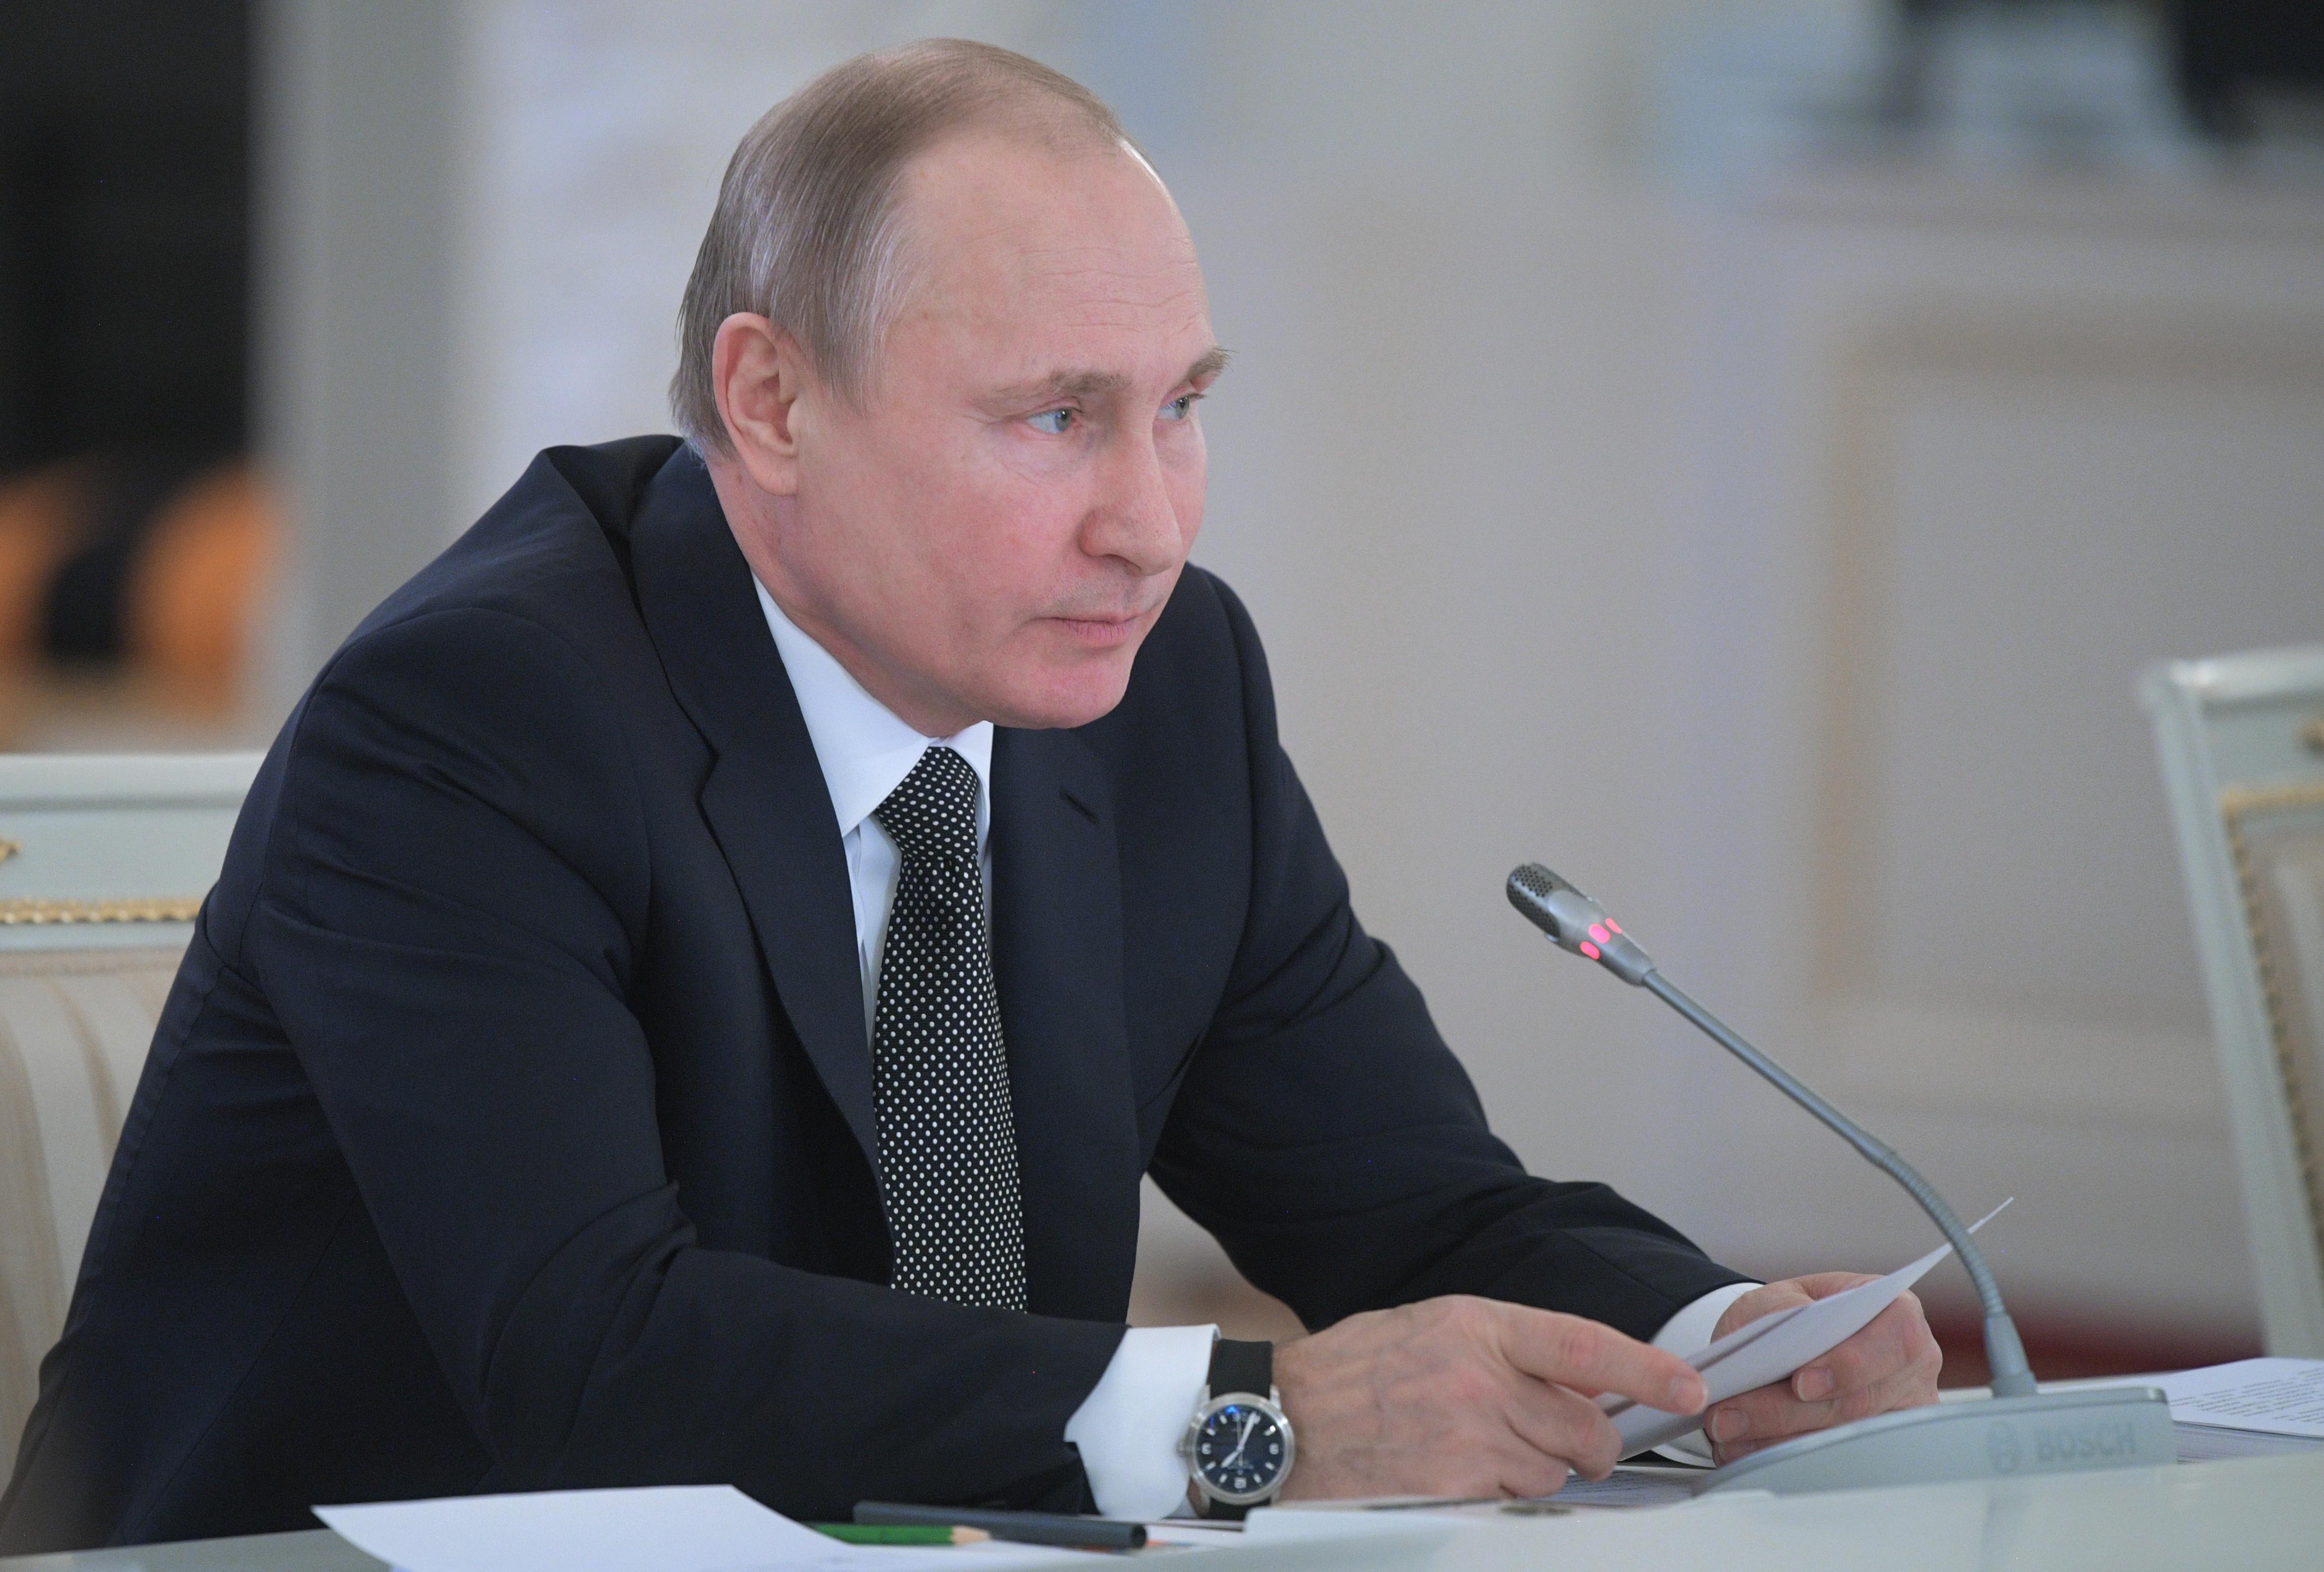 <p><span>Владимир Путин. Фото: &copy;РИА Новости/Алексей Дружинин</span></p>